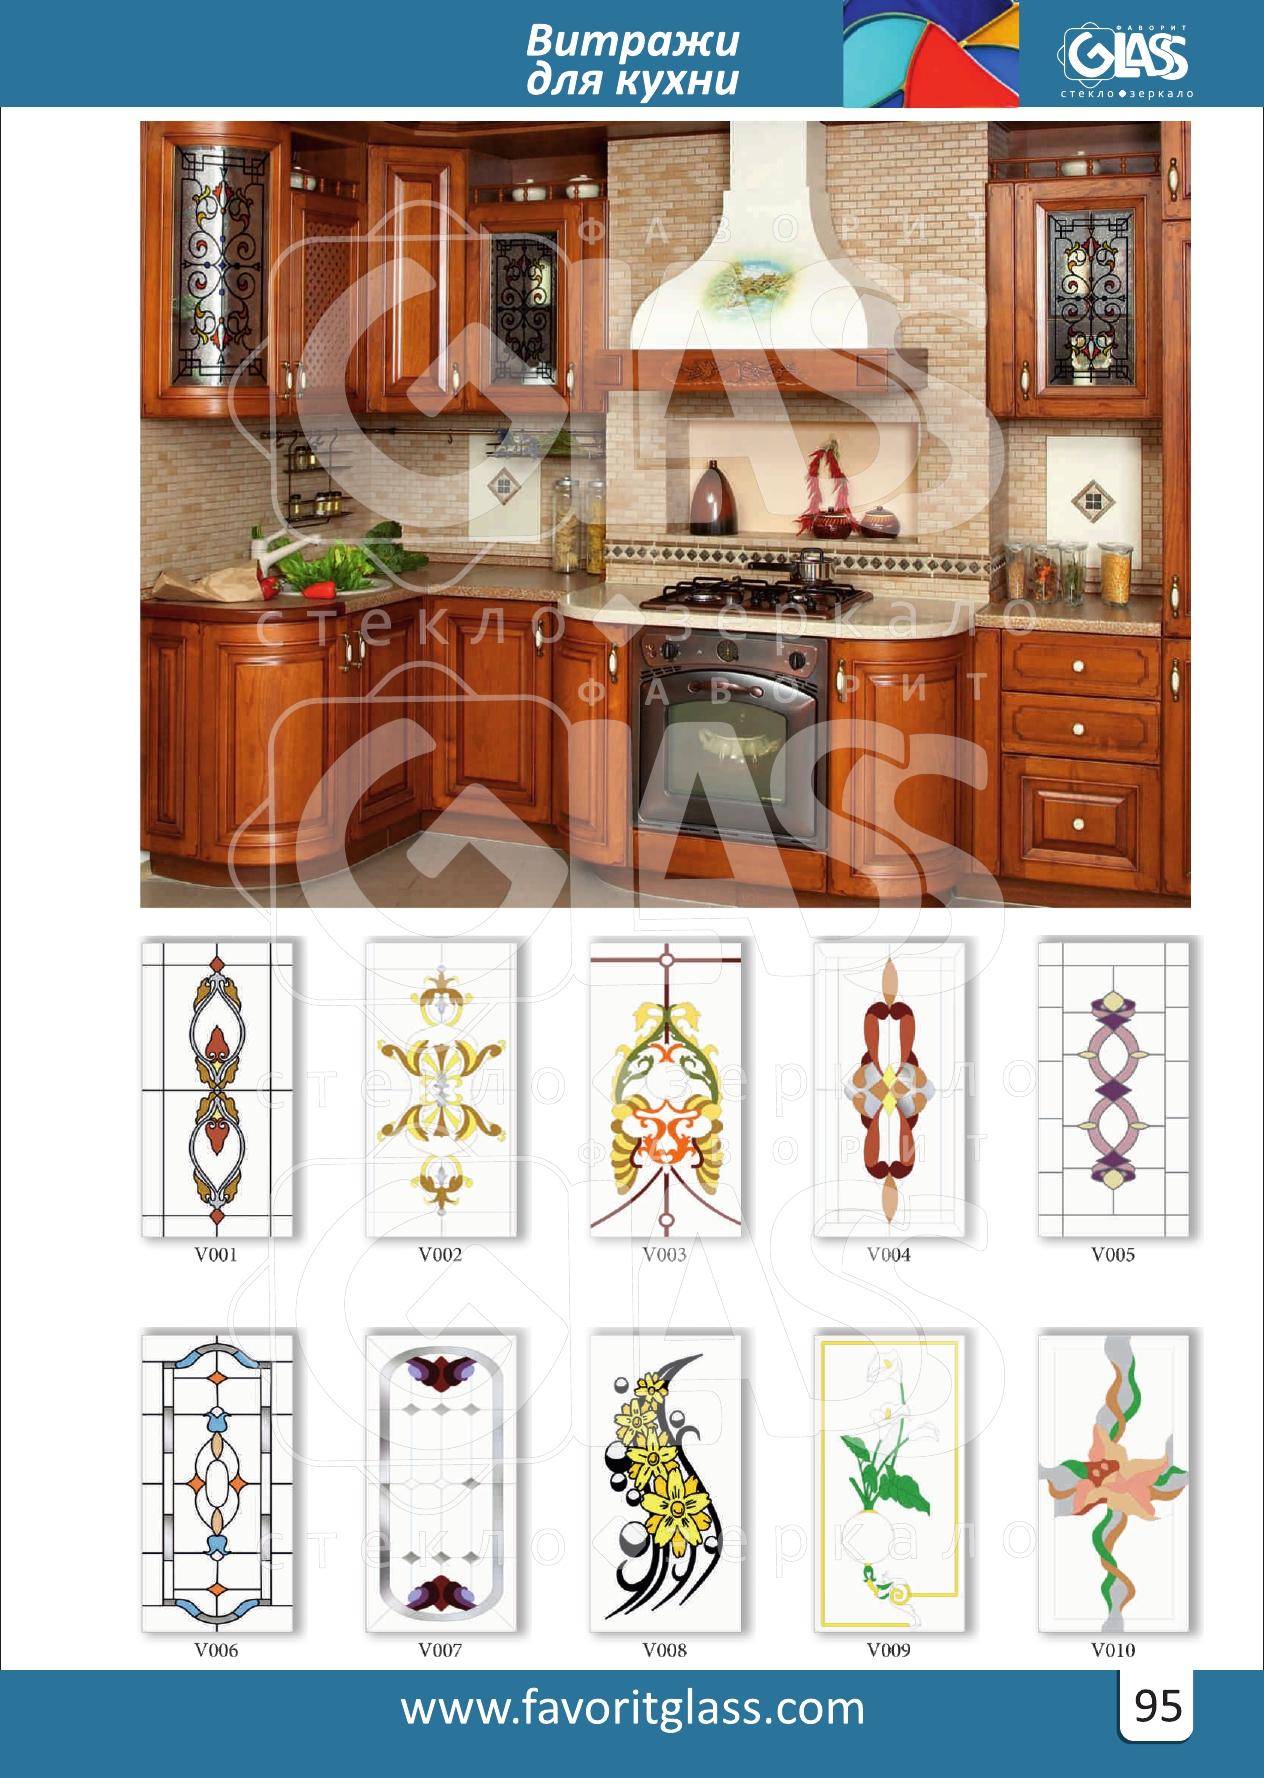 Glass (favorit)  vitrage_000096.jpg